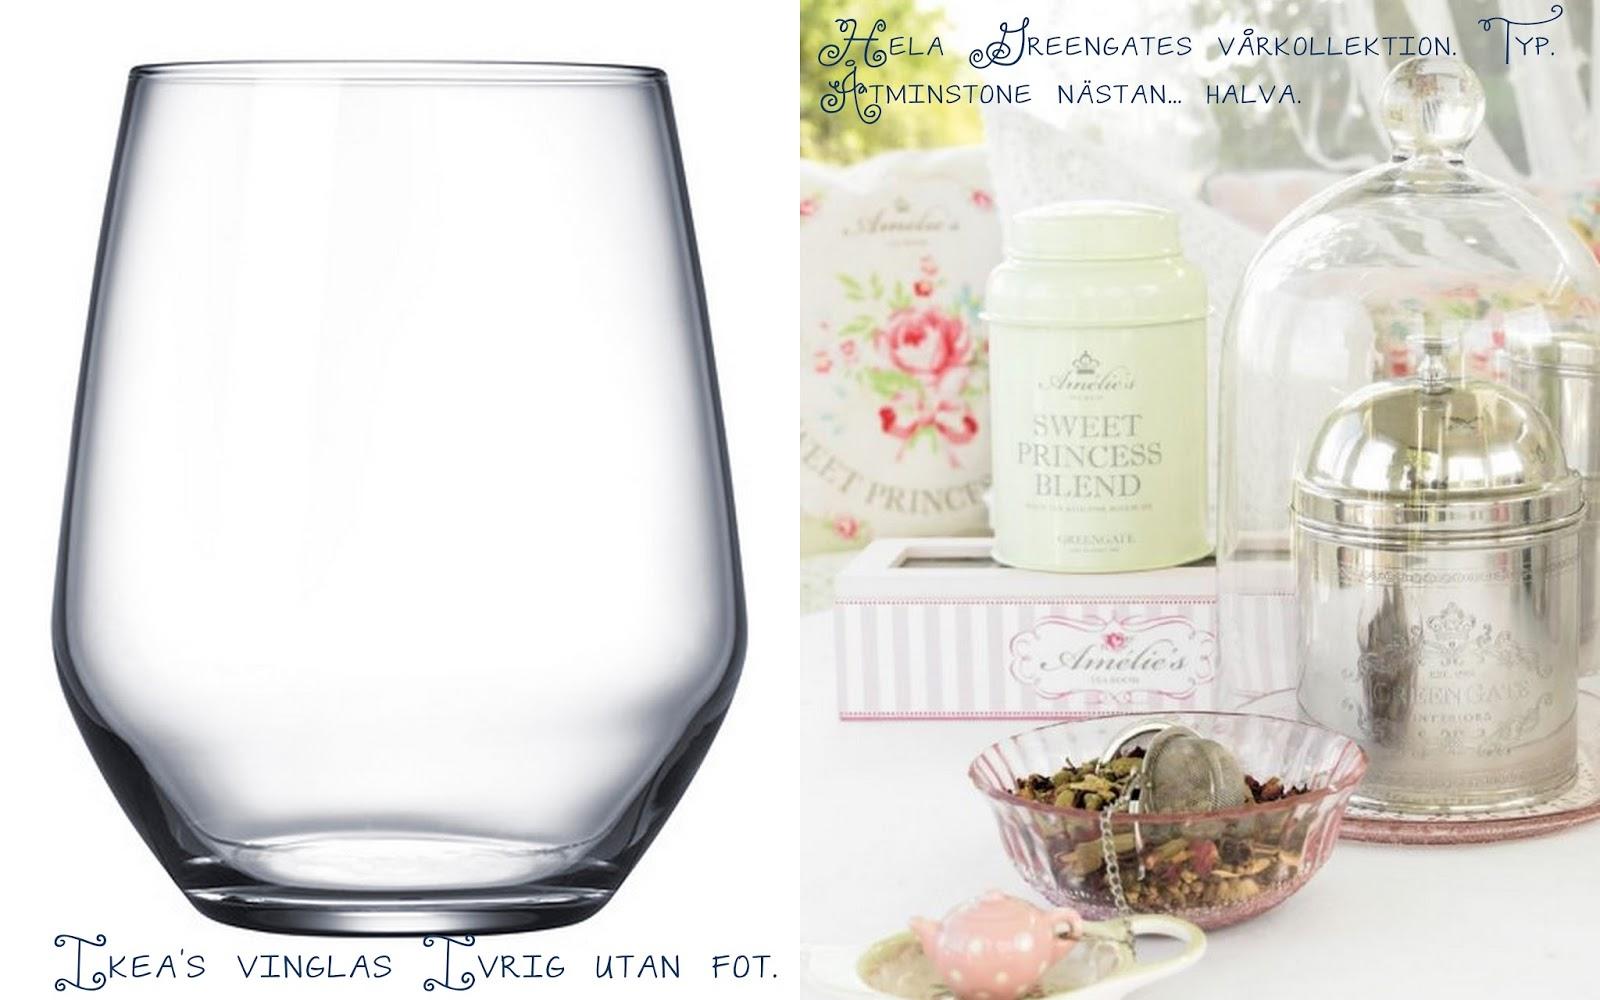 ikea, greengate, wine, home decor